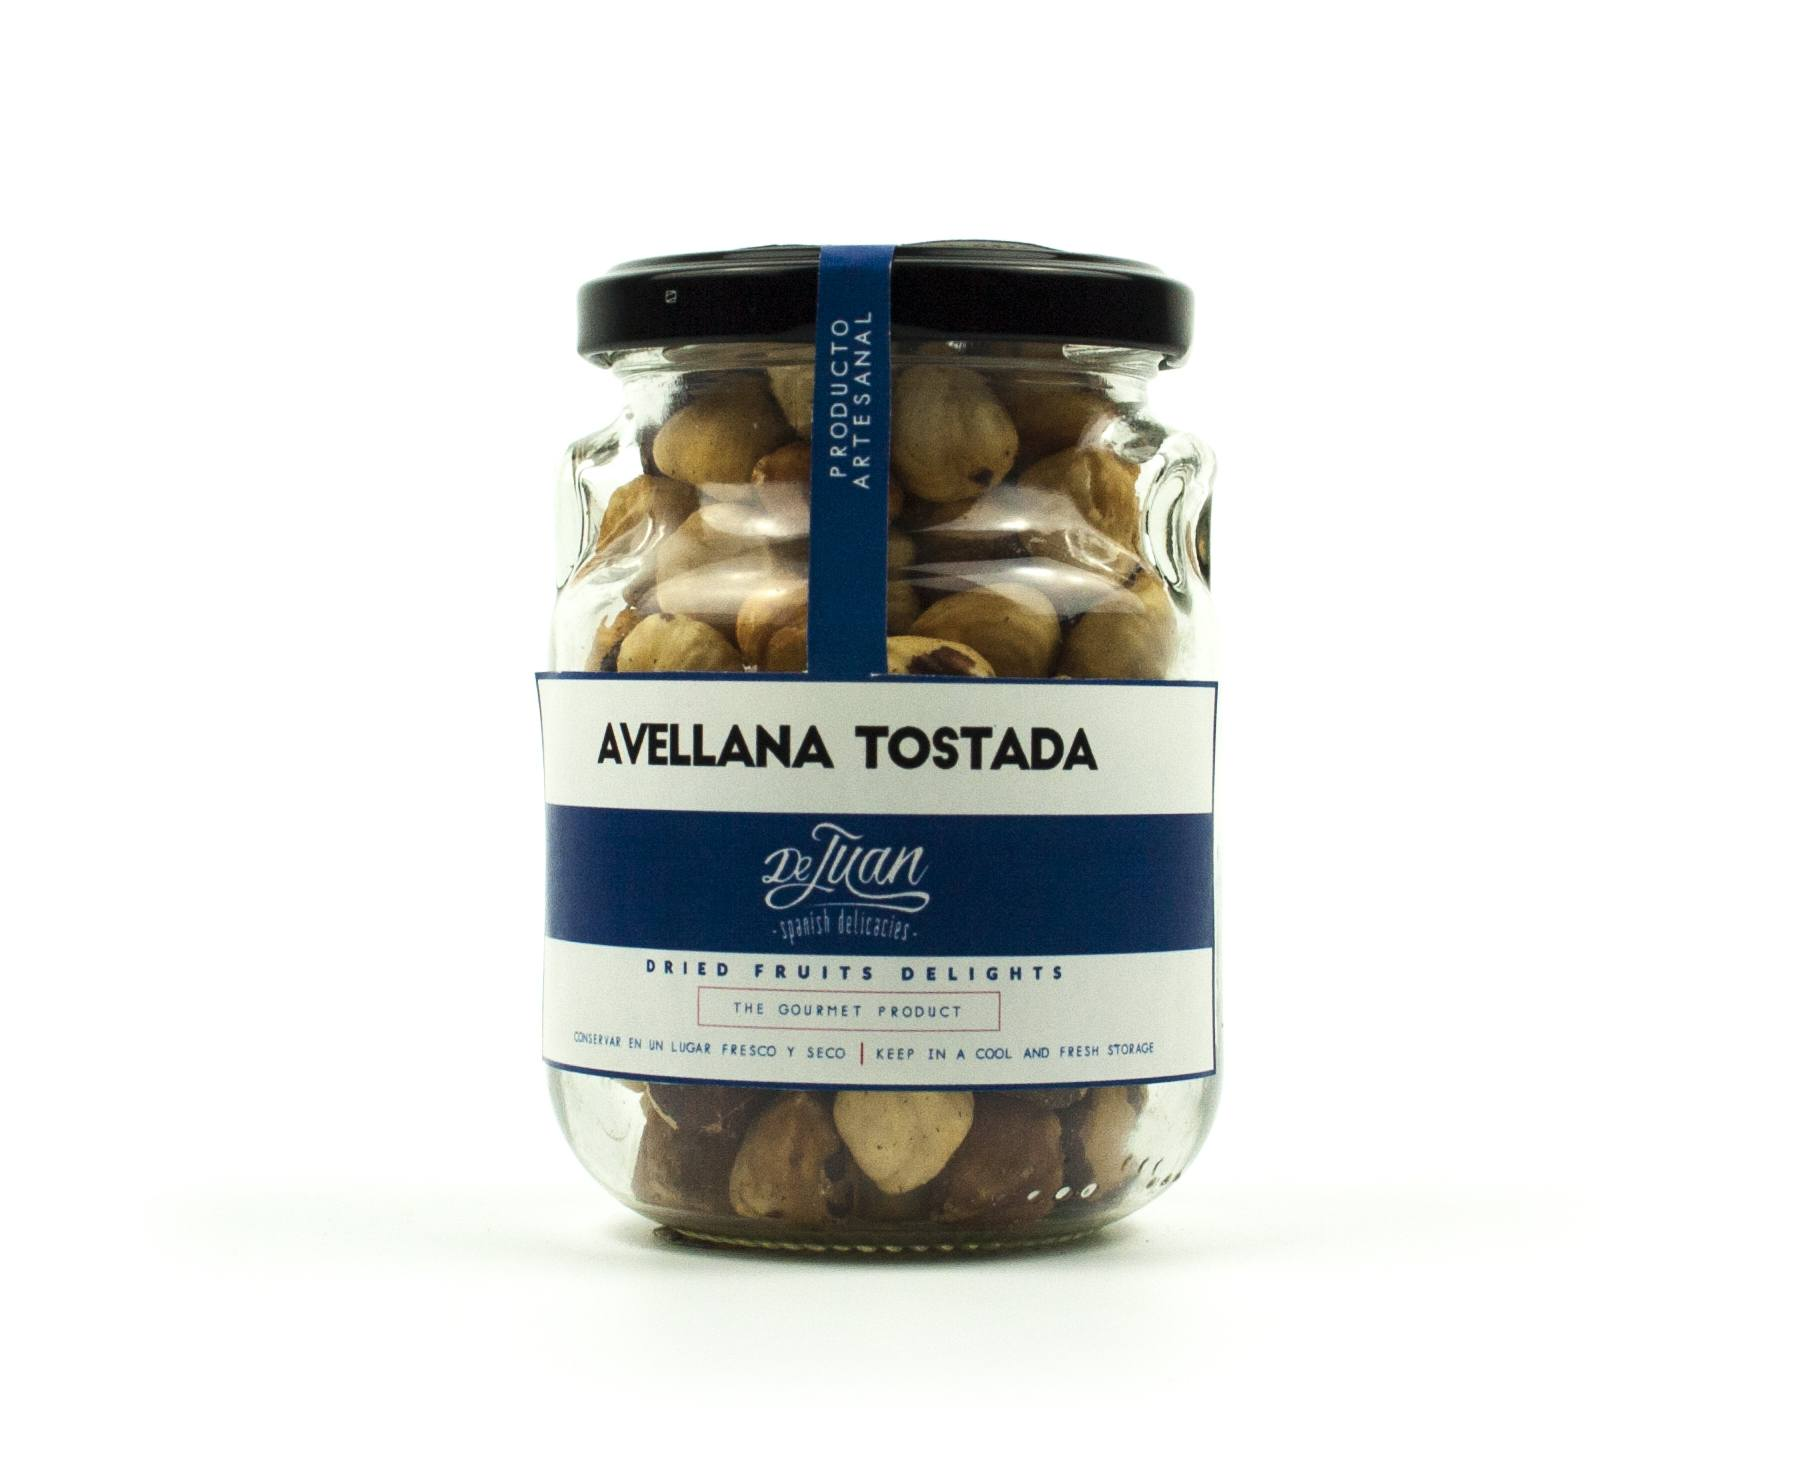 Avellana Tostada